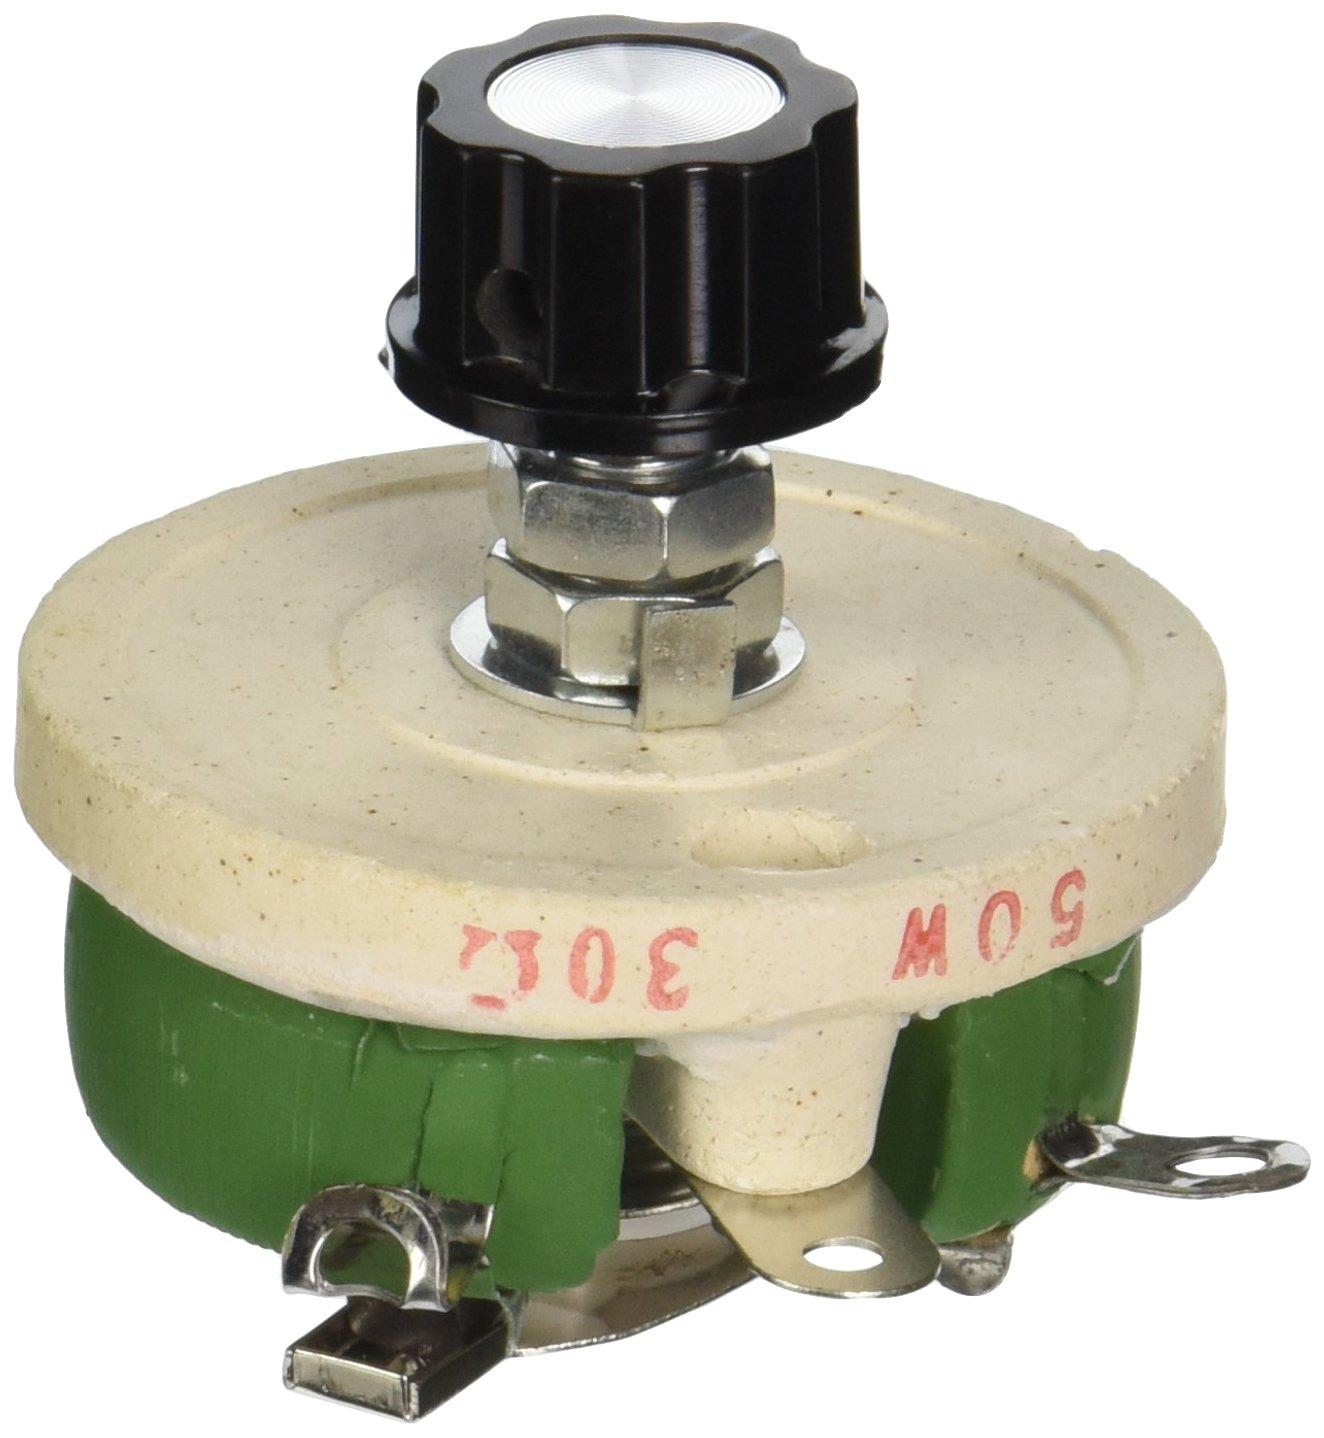 50w 10 ohm potenci/ómetro cer/ámica cono variable de resistencia olla reostato Sourcingmap